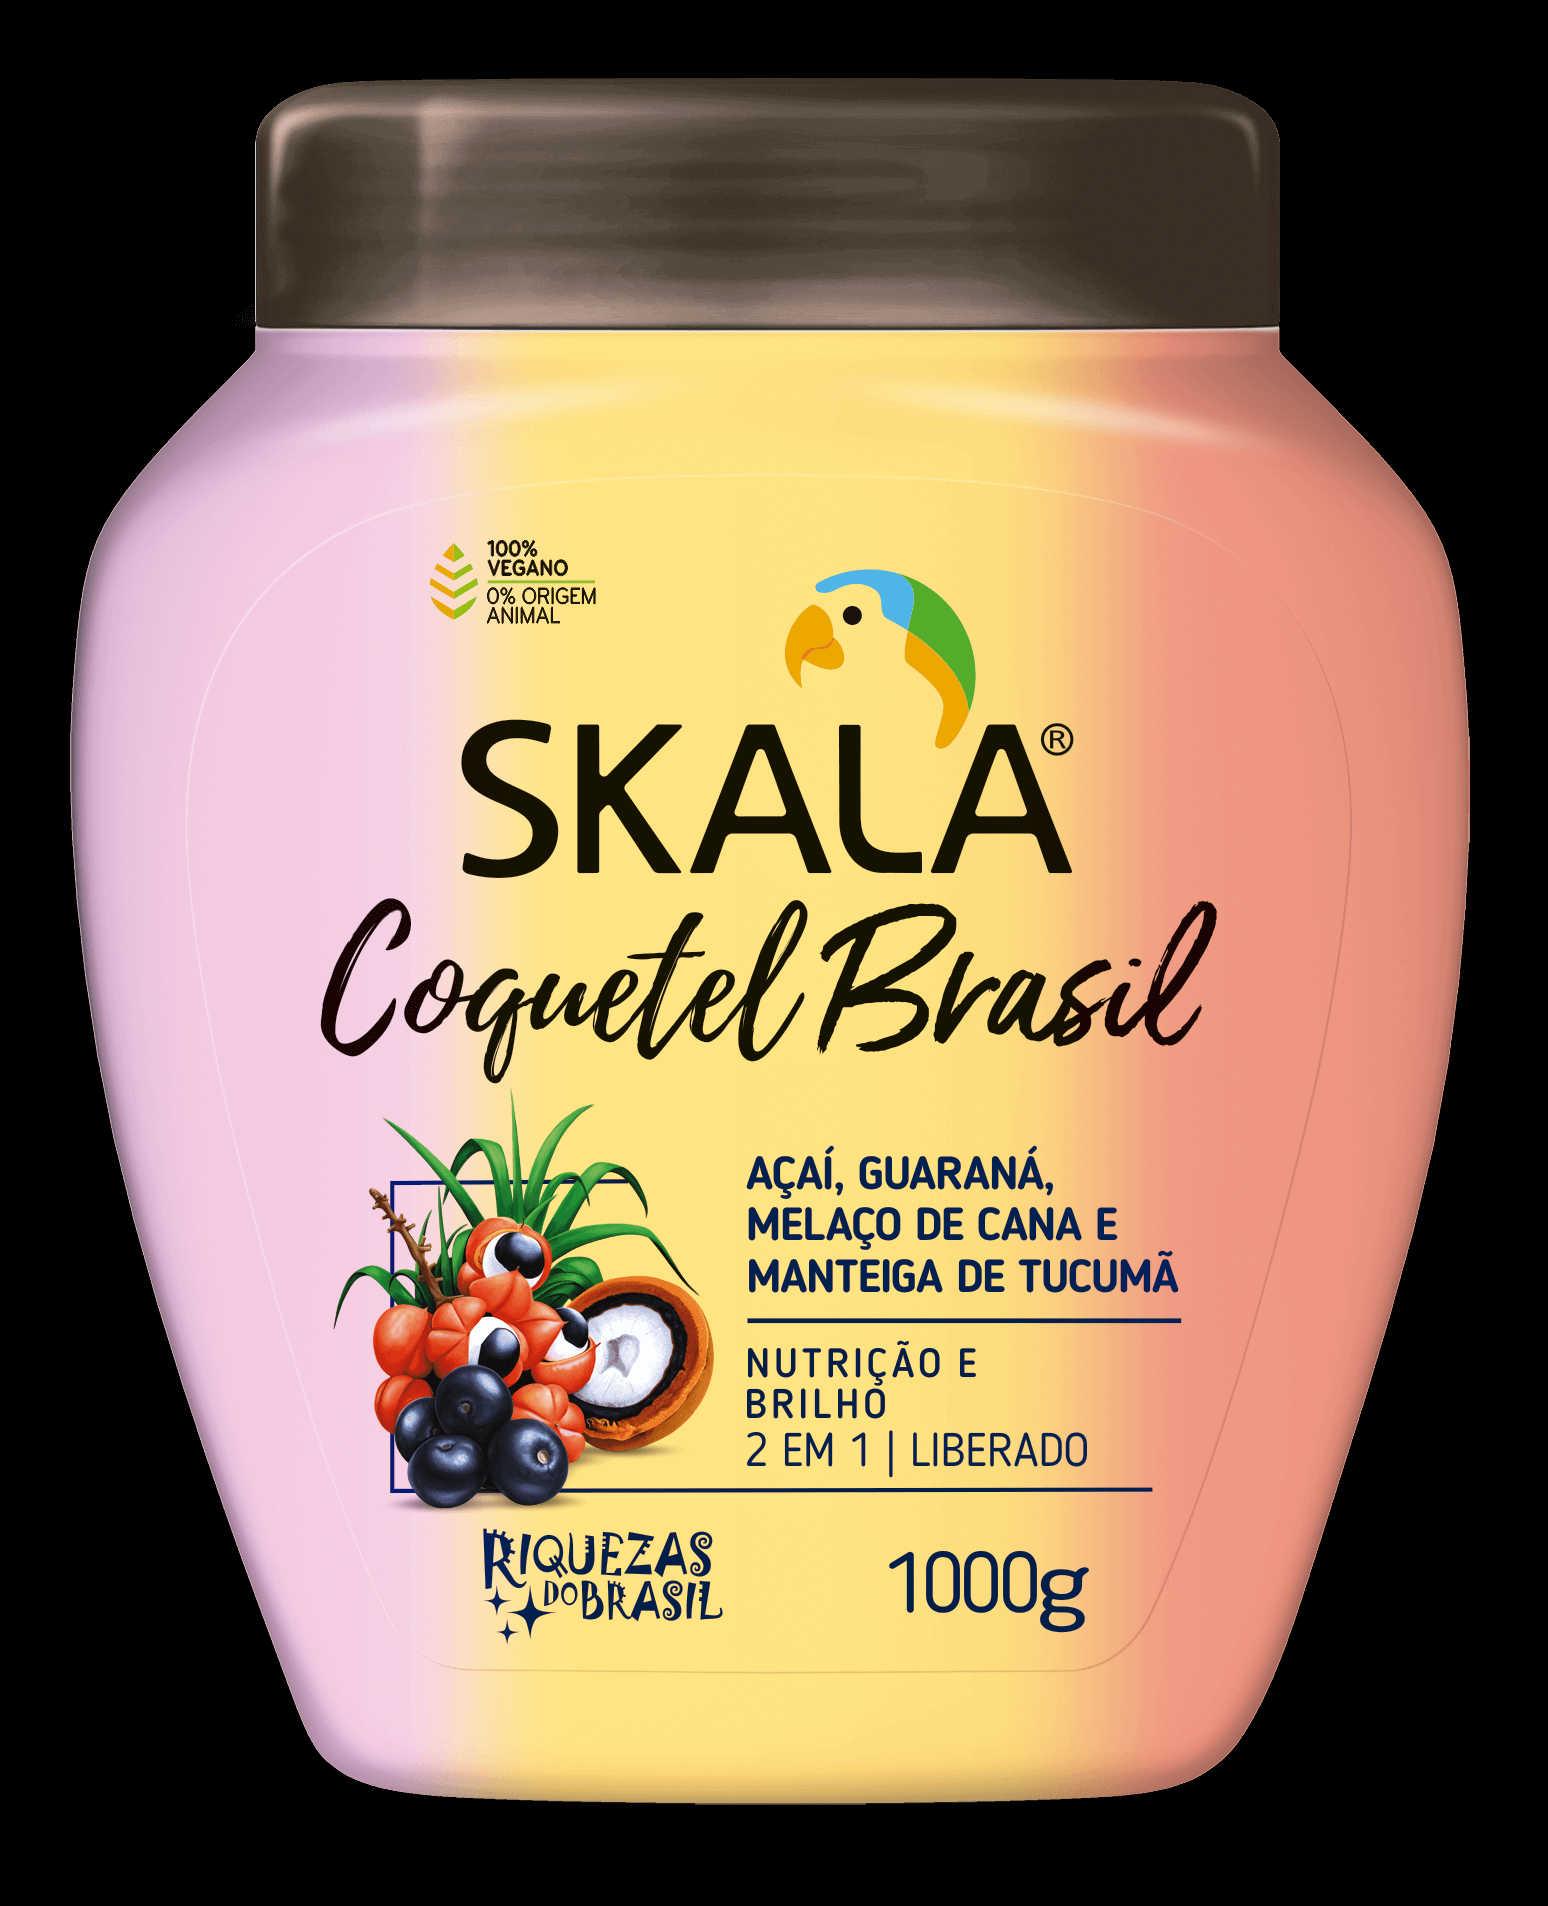 CREME DE TRATAMENTO 2X1 COQUETEL BRASIL 1KG - SKALA